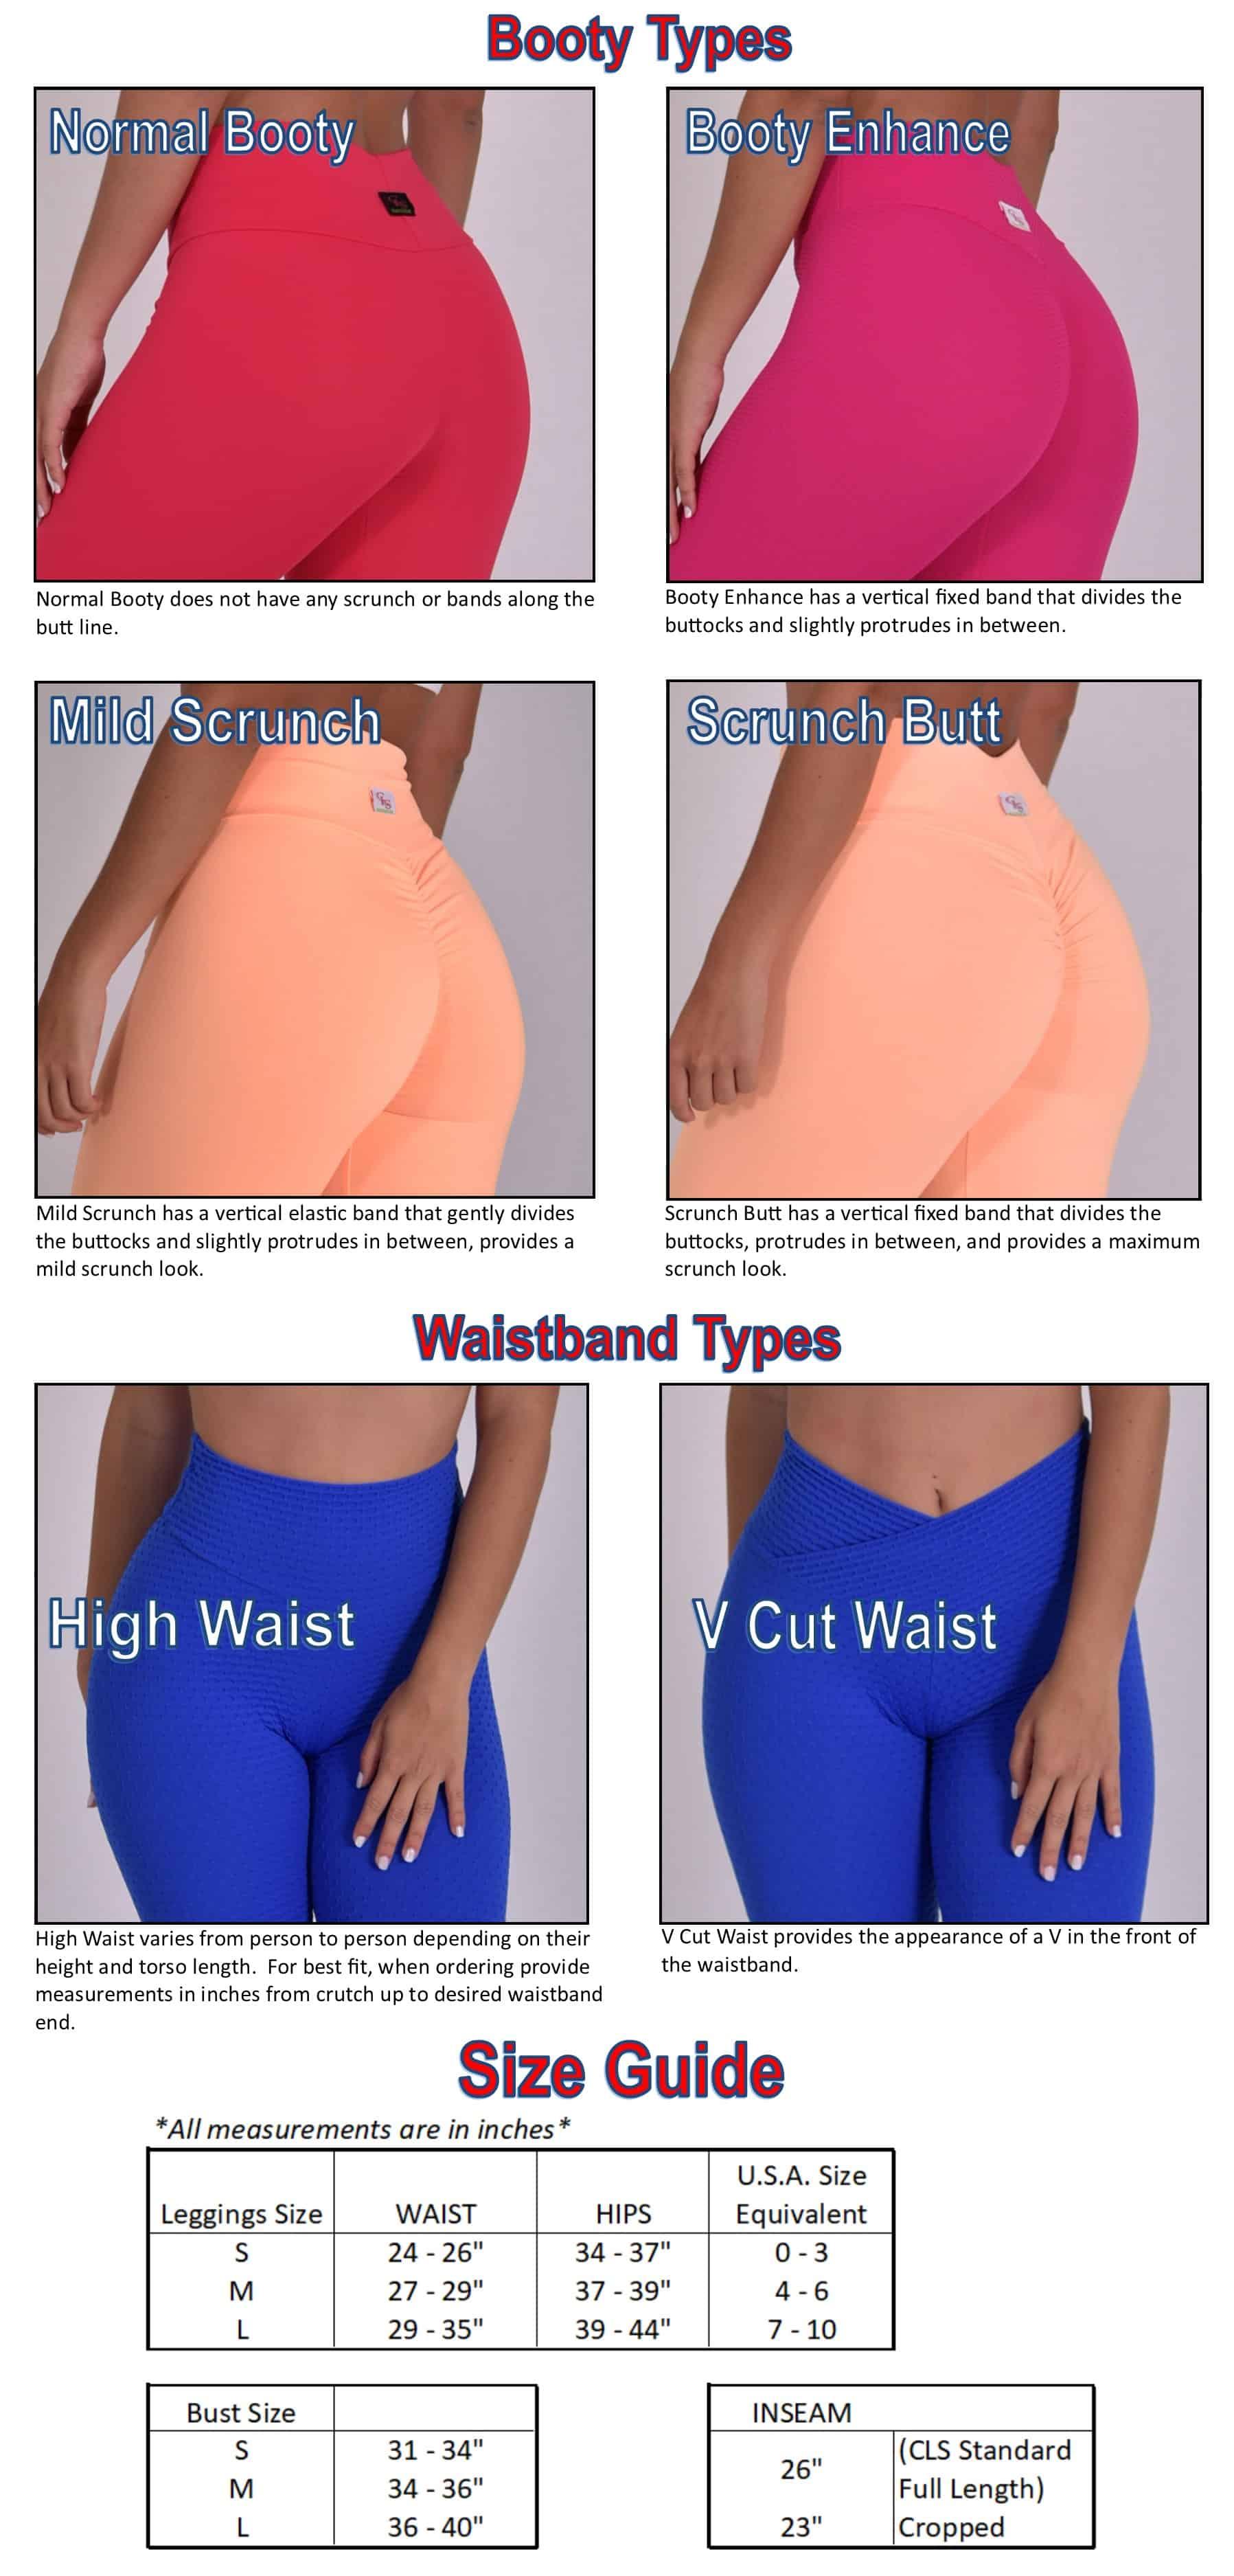 cls sportswear - leggings, scrunch butt, yoga pants, tights